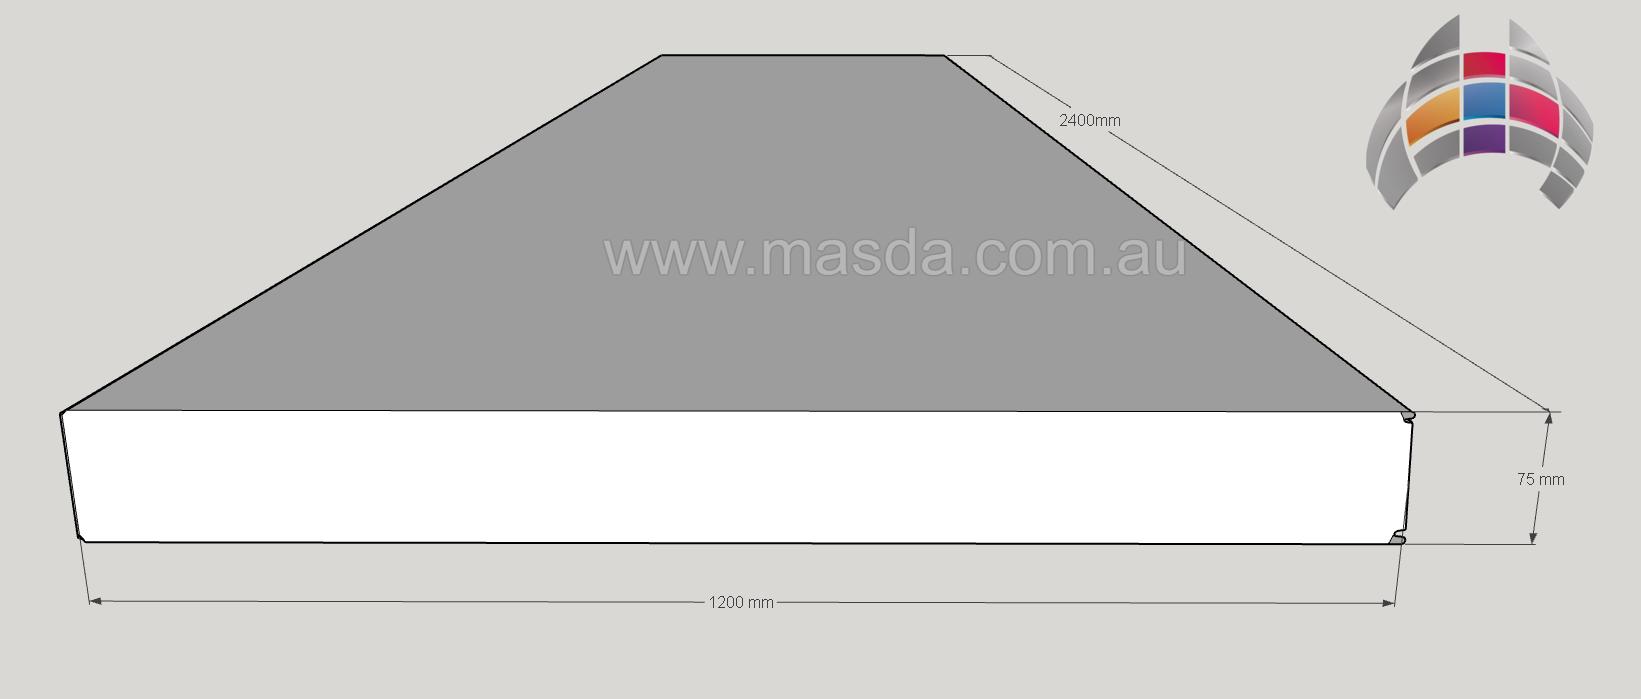 Masda Wall Panel 75mm